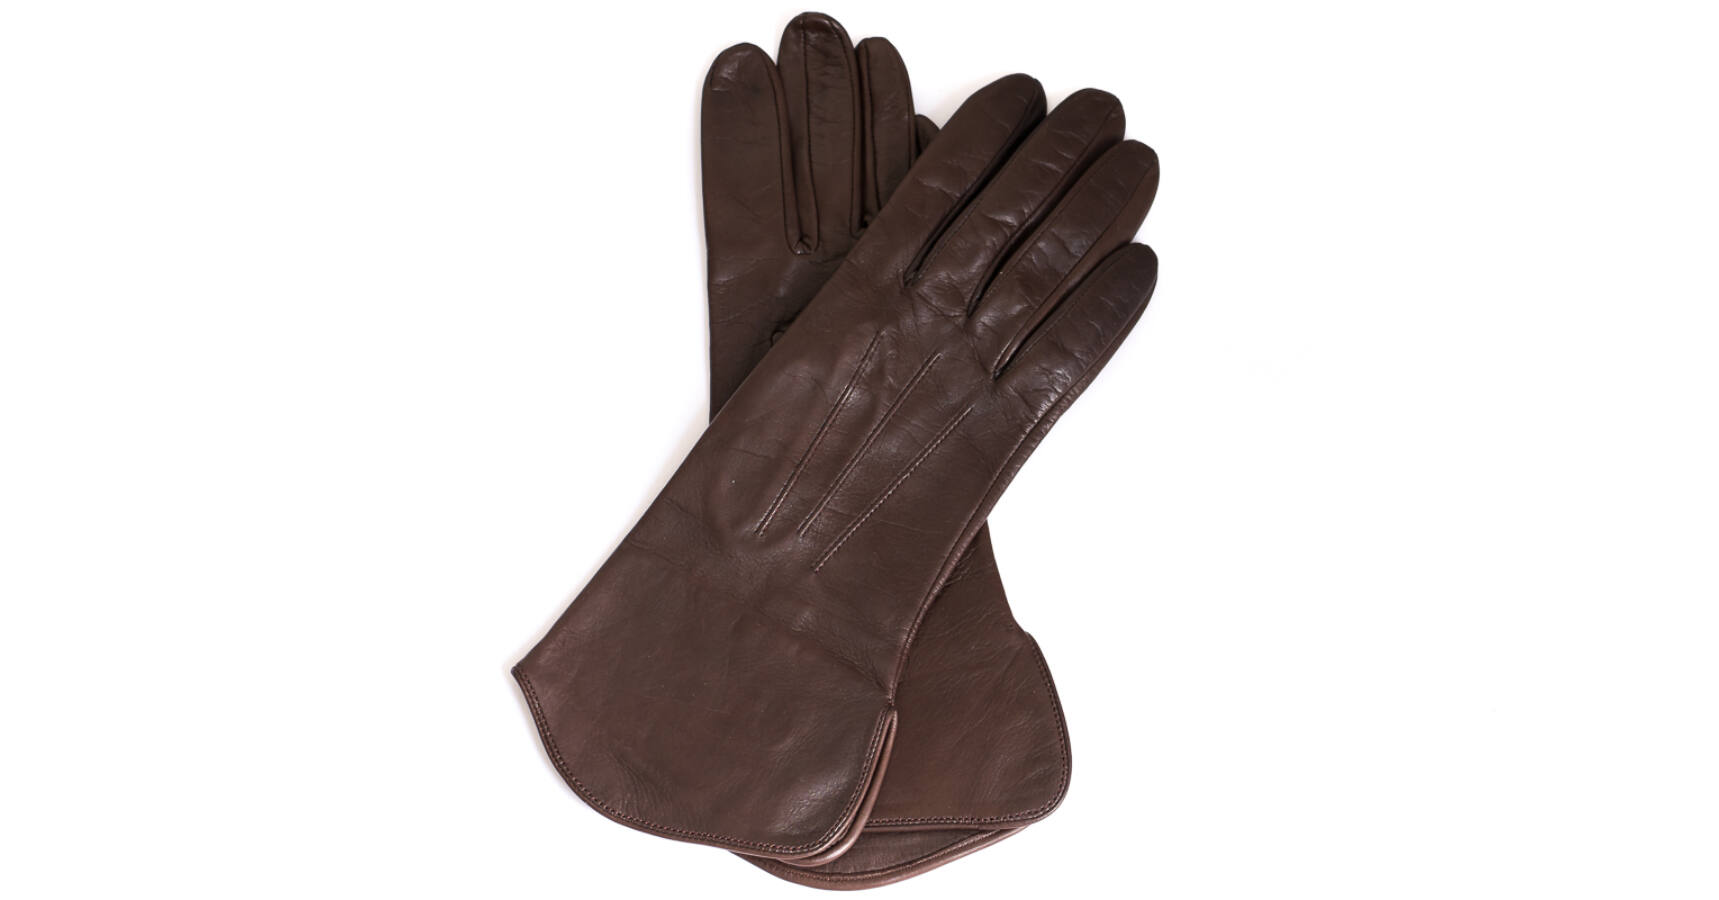 Harssidanzar Lady Fingerlose Lederhandschuhe Schaffell Single Line Half Finger GL012